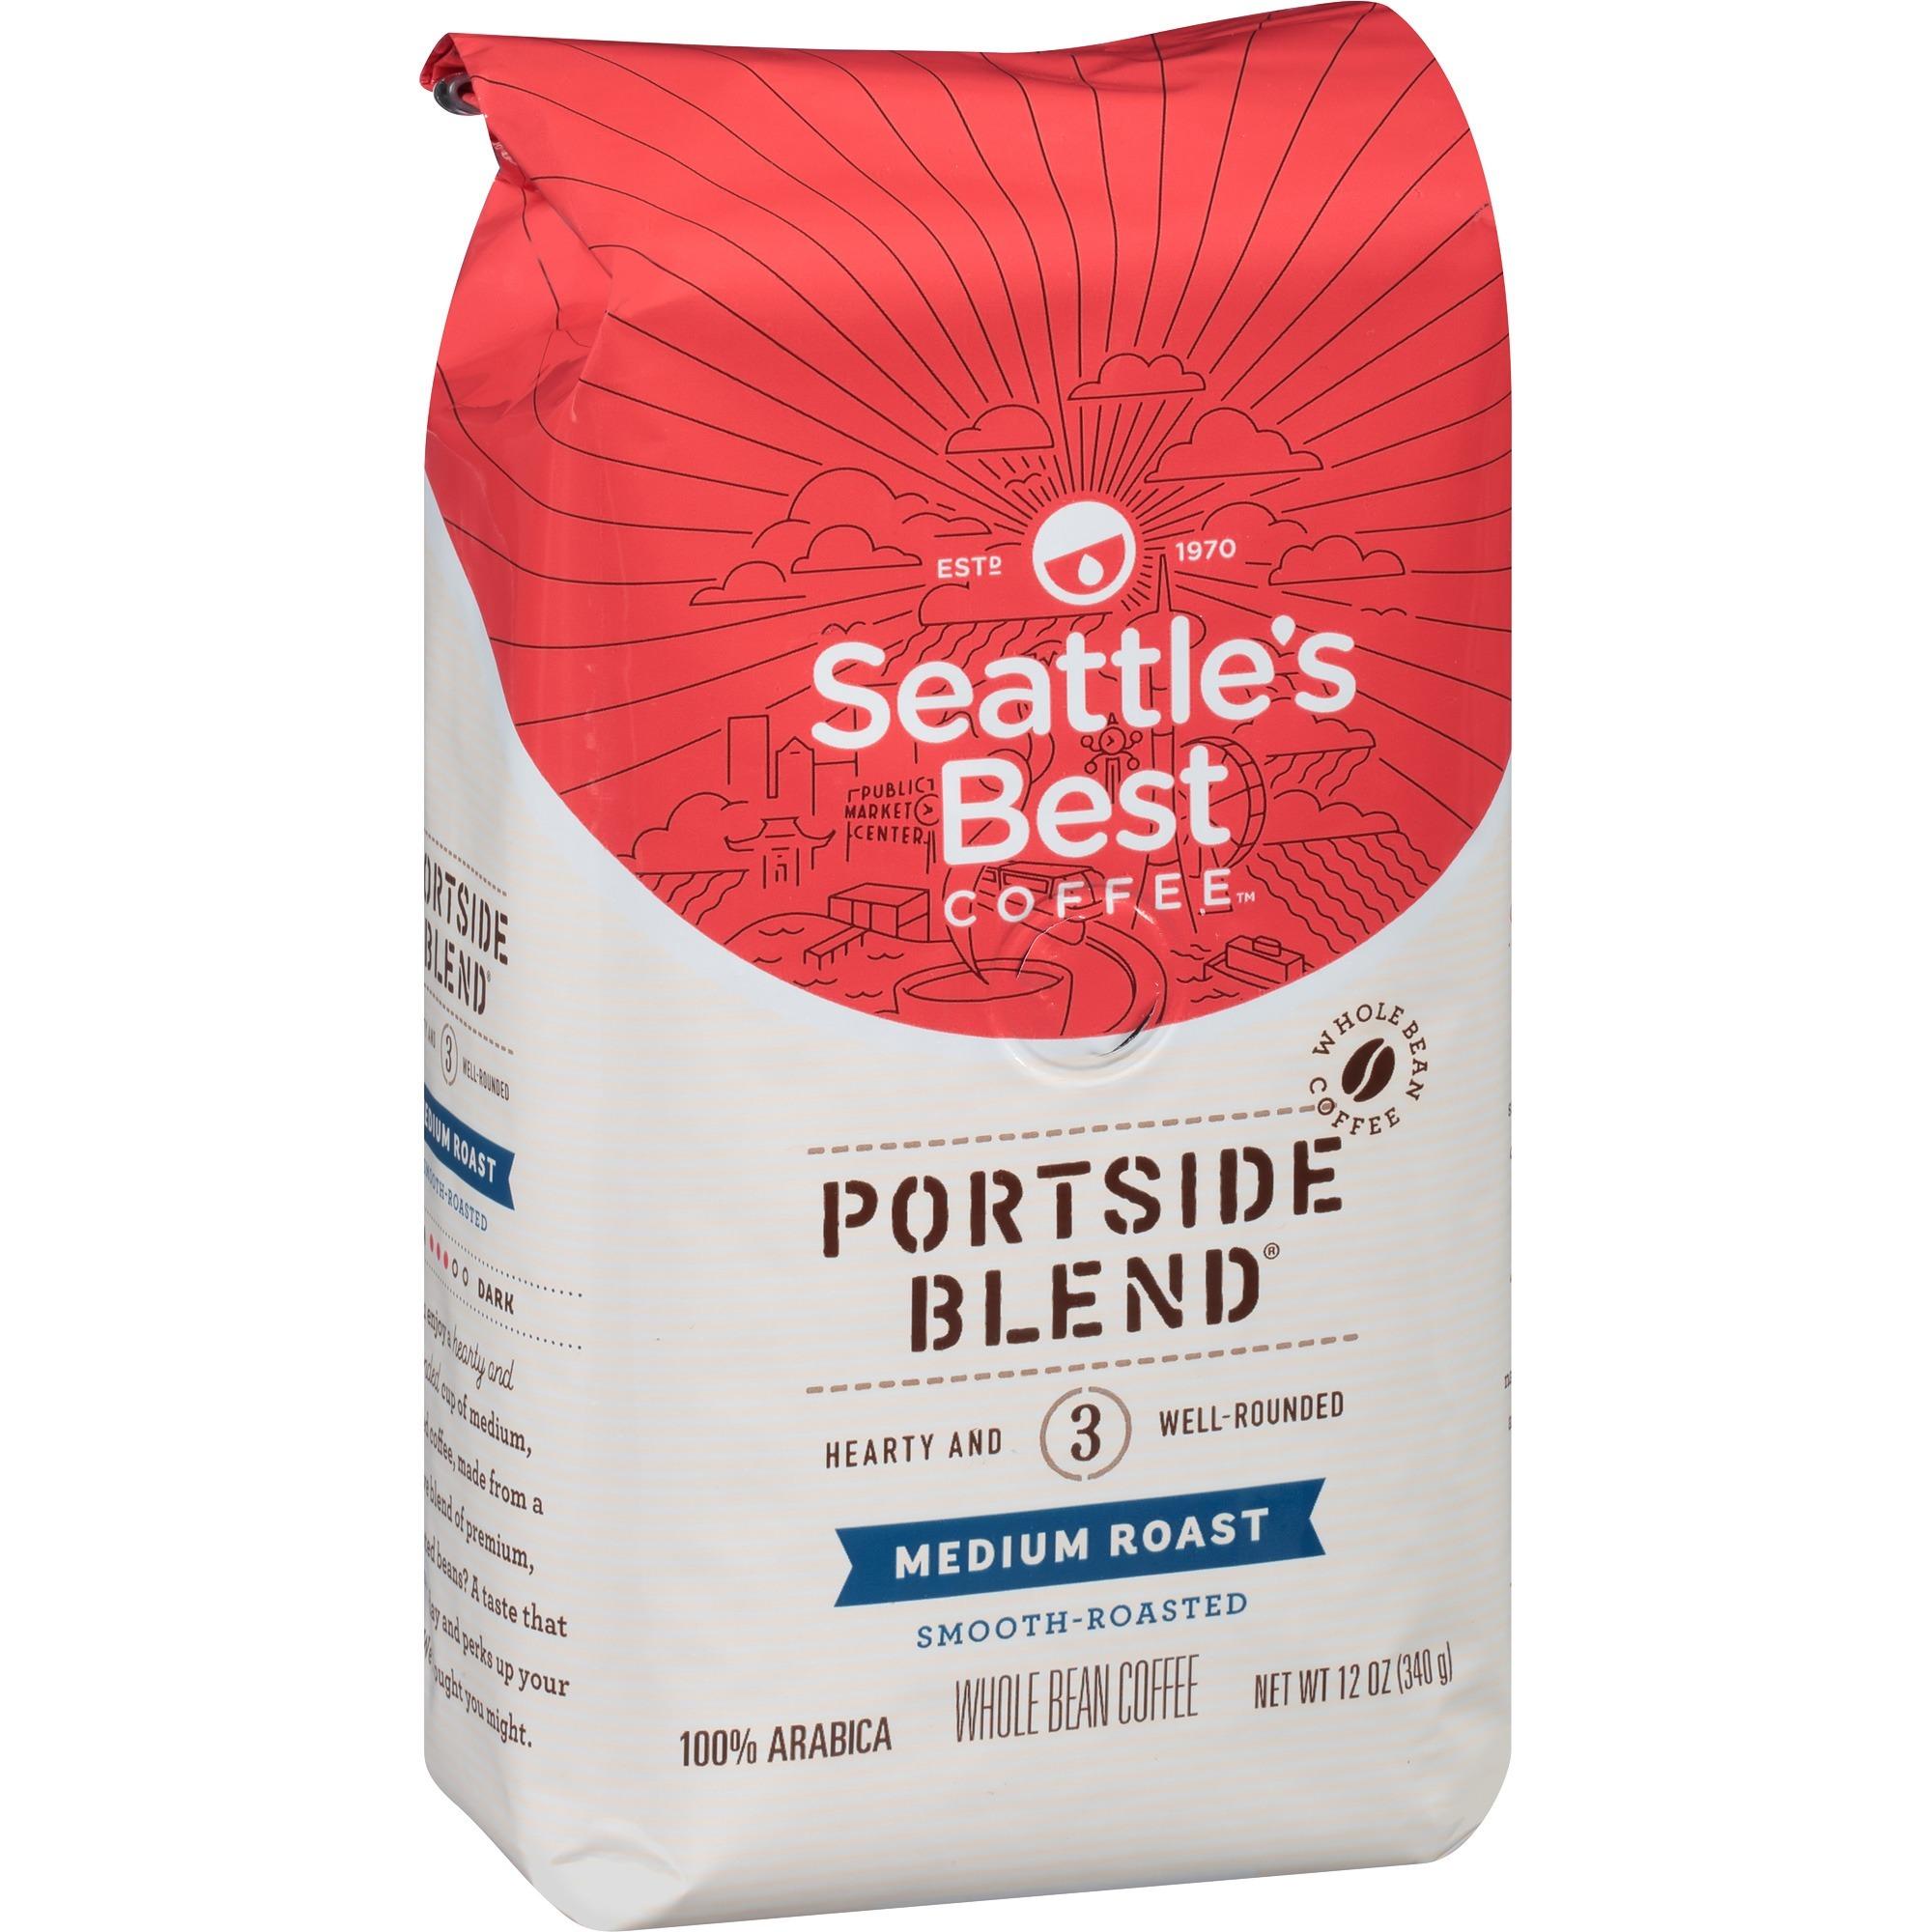 Seattles Best Coffee, Llc Seattles Best Coffee Portside Blend Whole Bean  Coffee - Level 3 - Regular - Nutty - Medium - 12 Oz - 1 Each